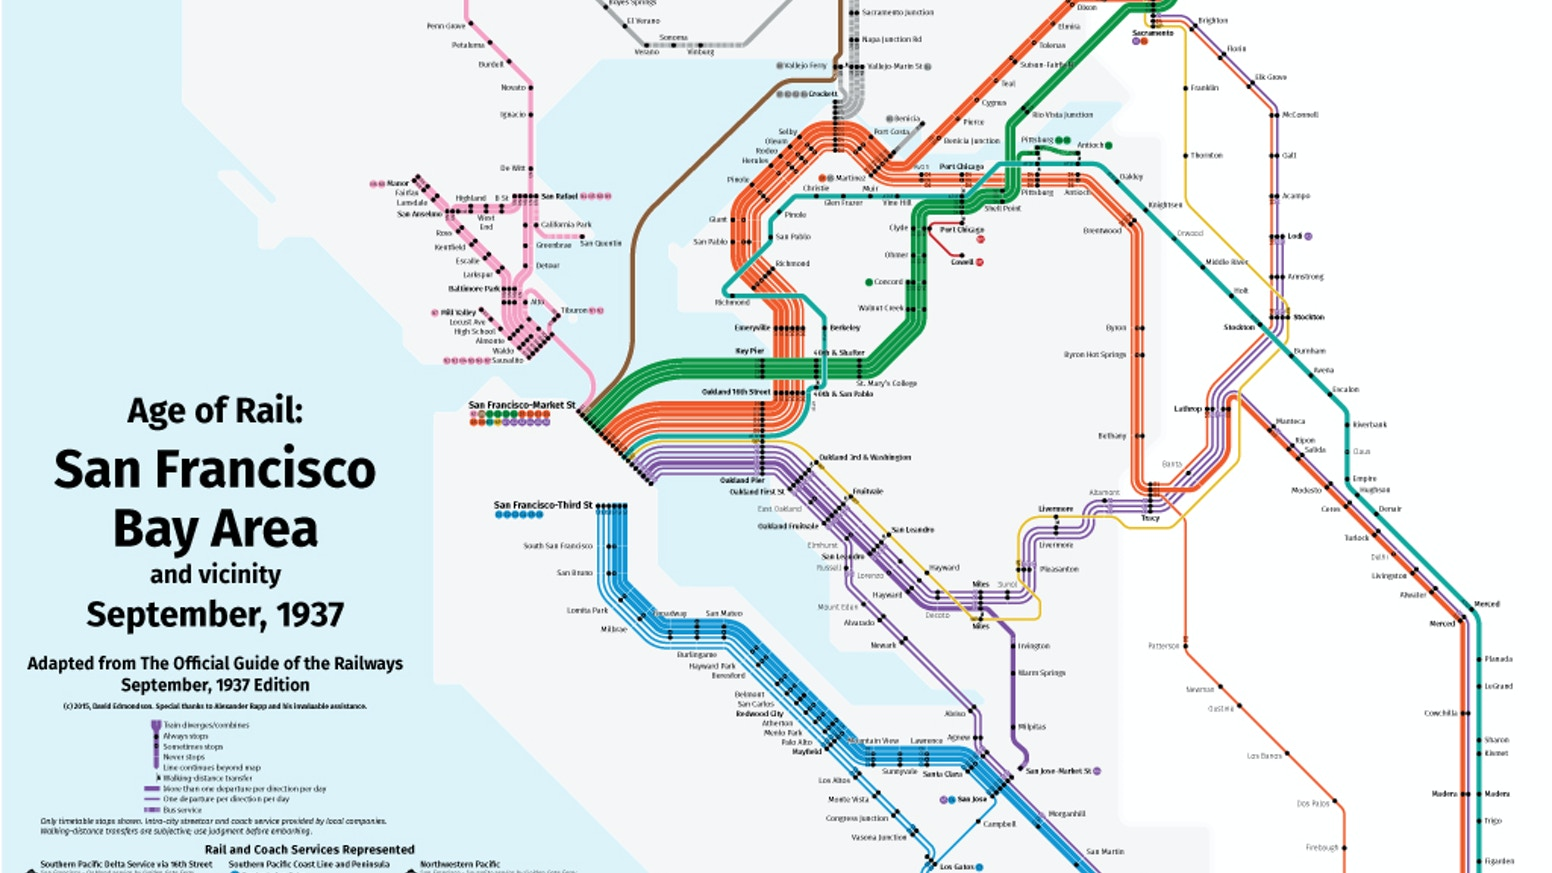 new maps of historic north american railroads by david edmondson